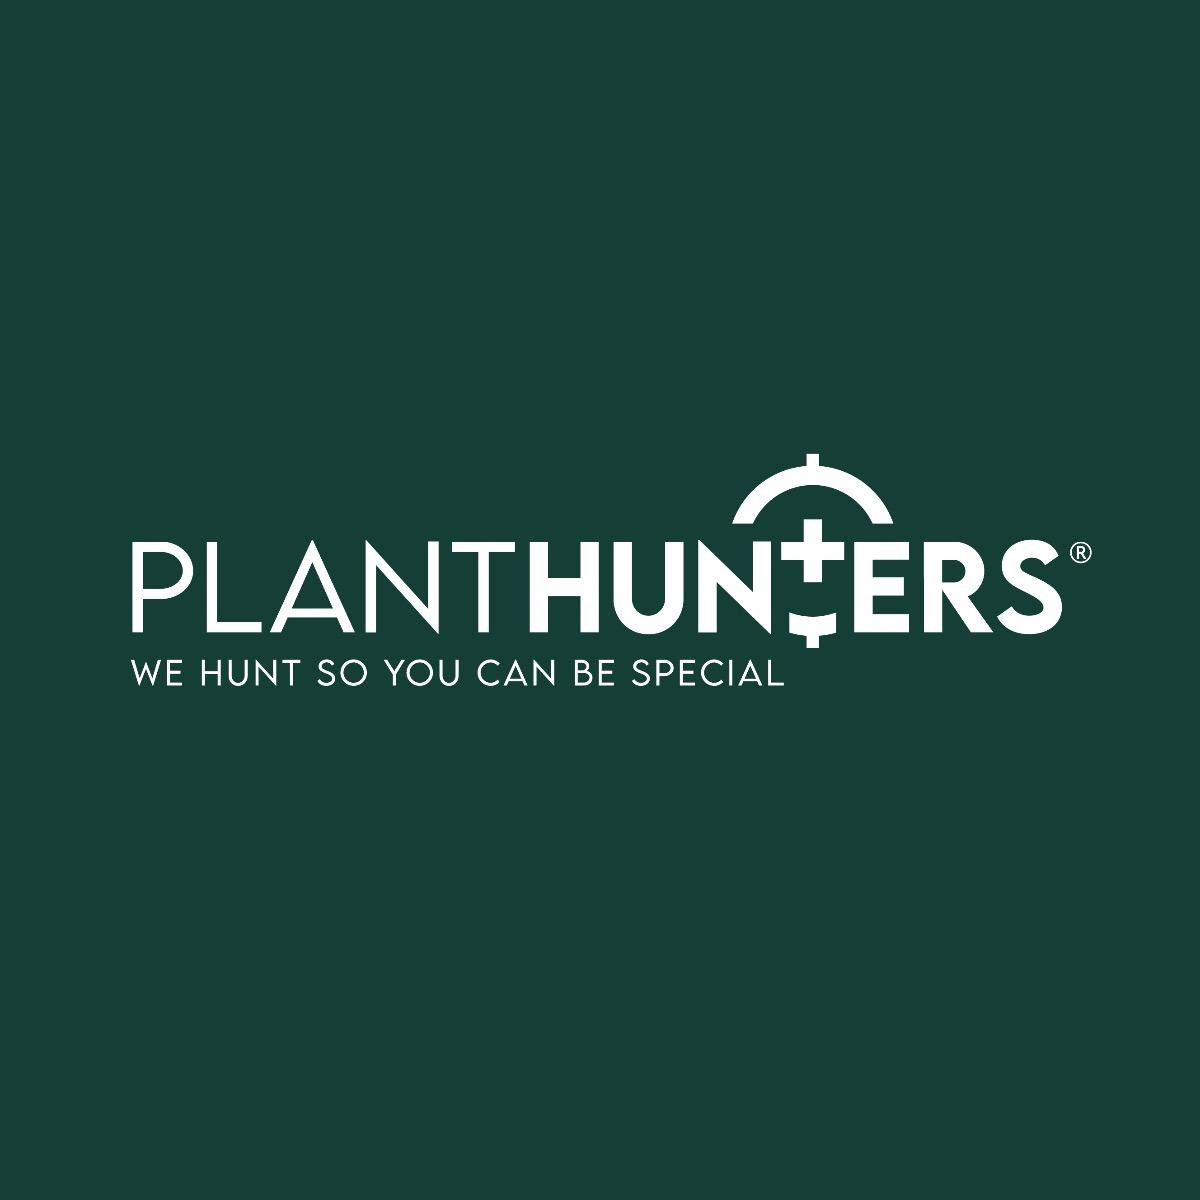 Logo Planthunters